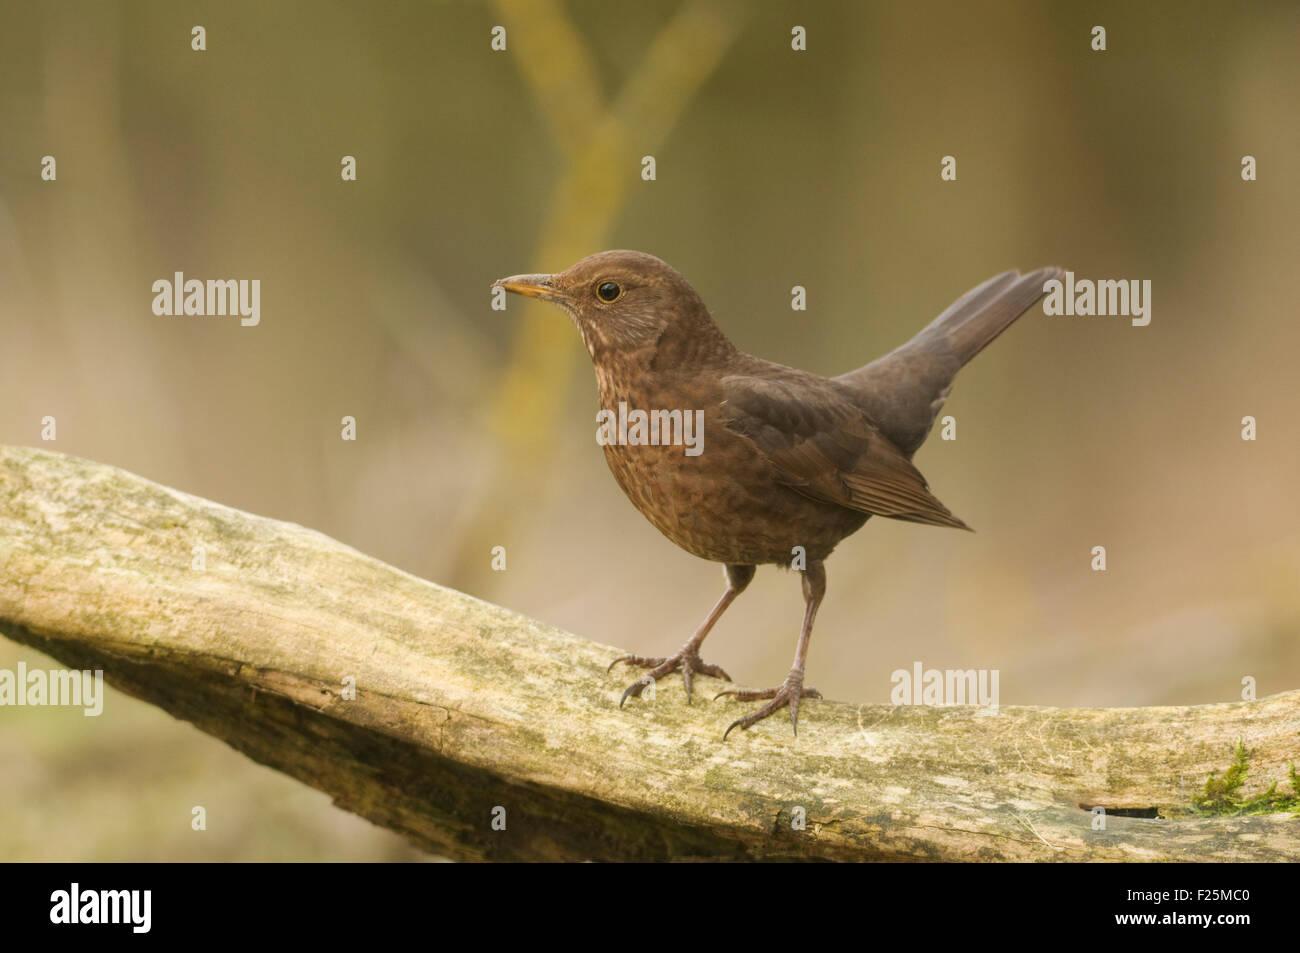 European Blackbird (Turdus merula) on Log - Stock Image